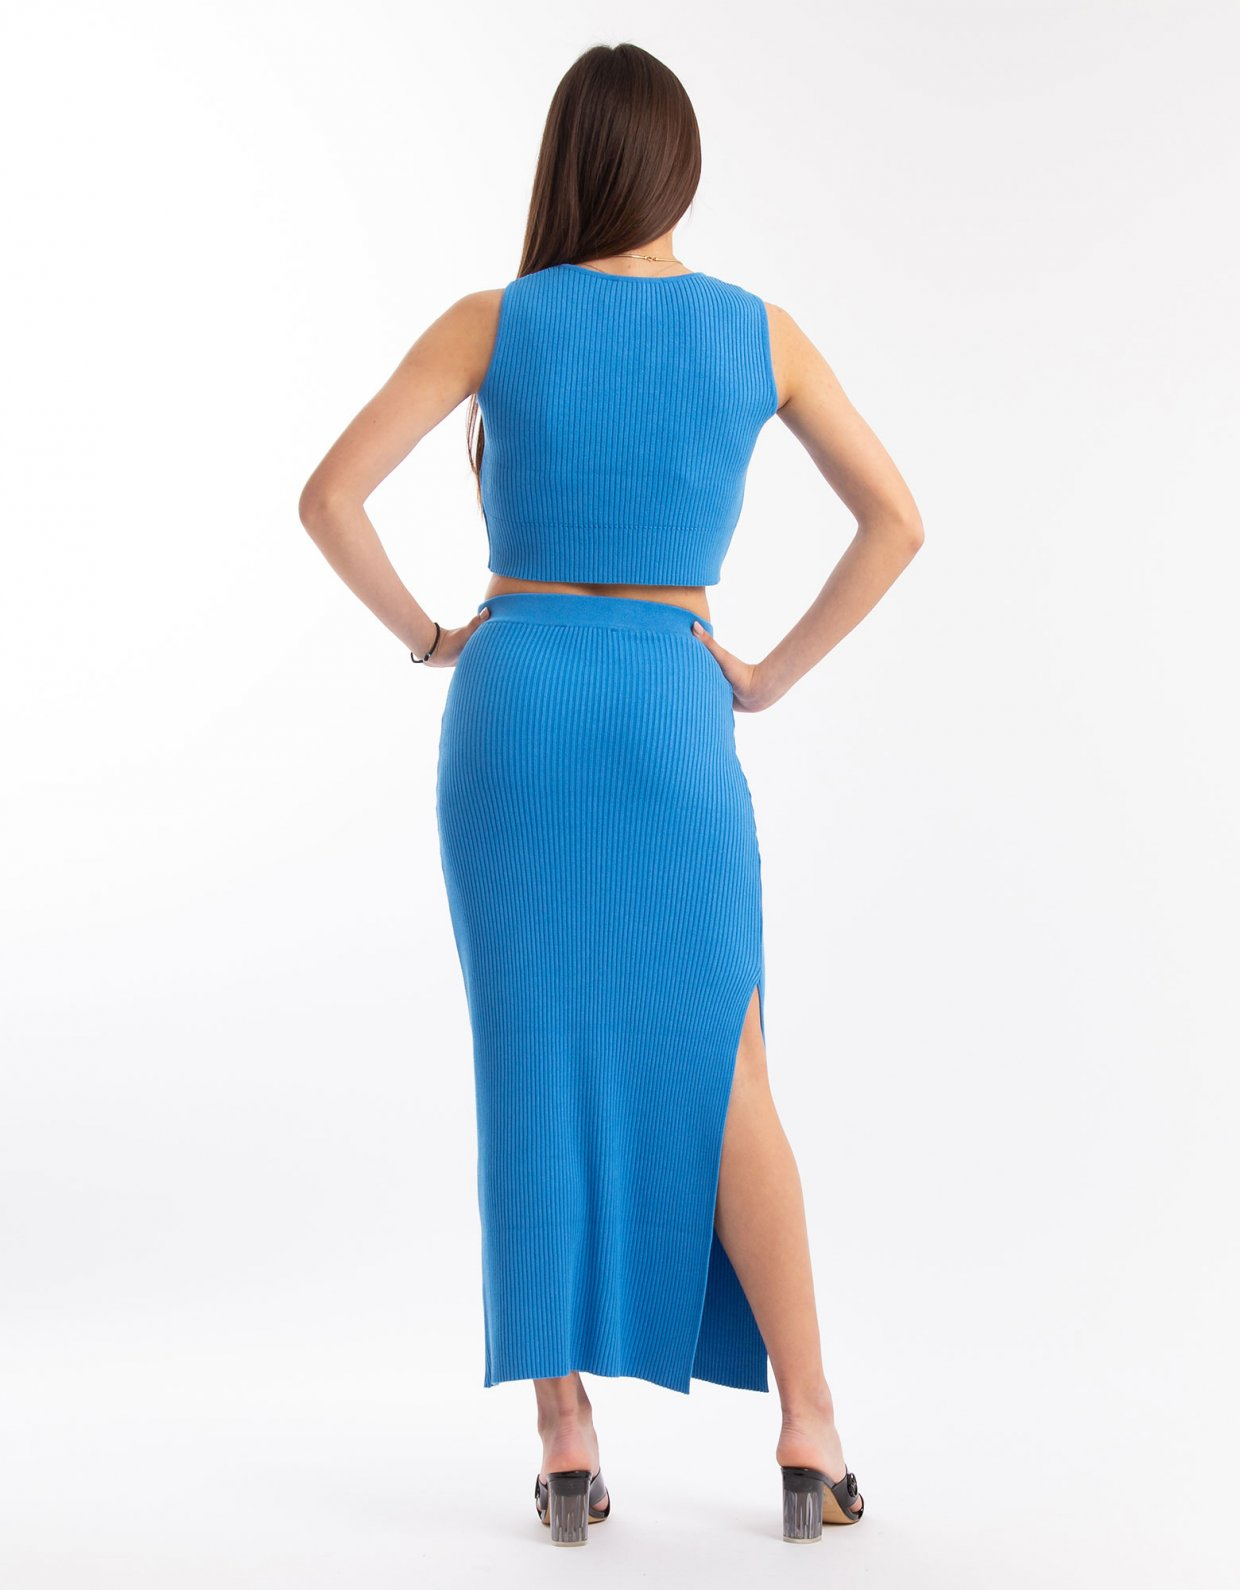 Combos Knitwear Combos S24 – Blue set